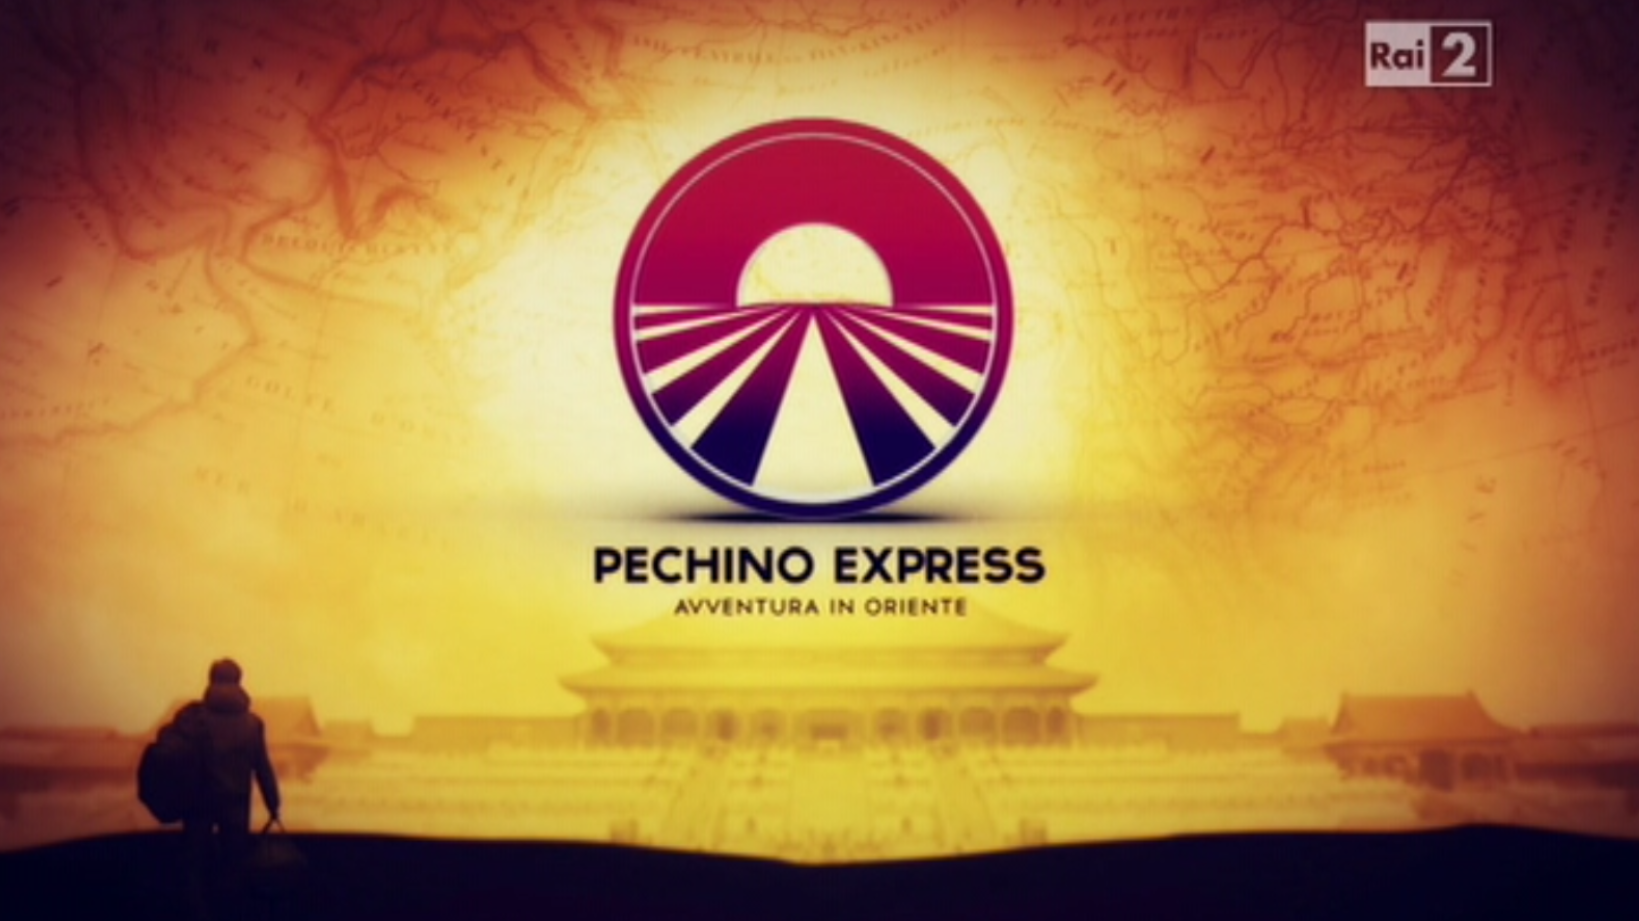 Pechino_Express_-_Avventura_in_Oriente